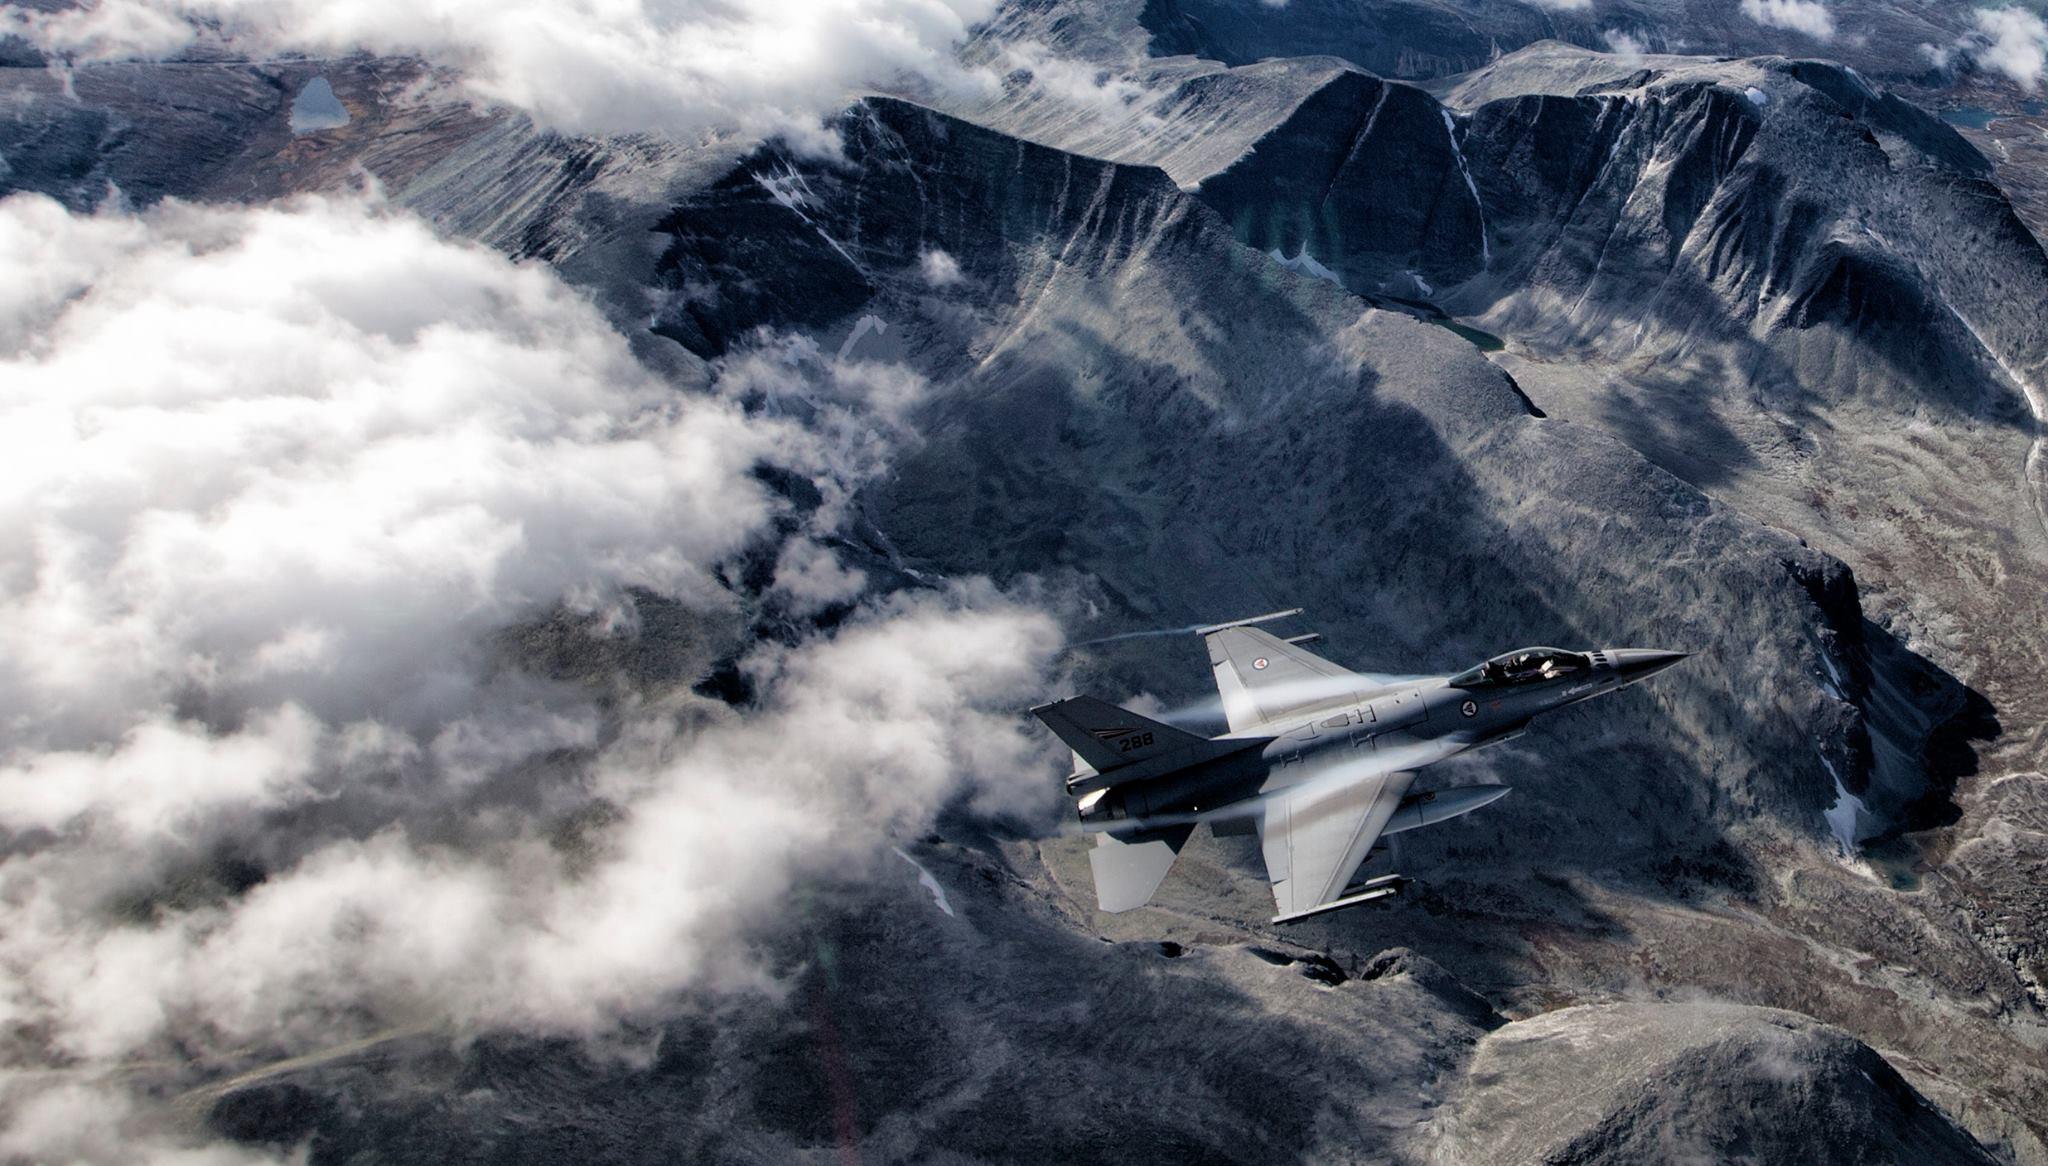 Norwegian F-16, mountain landscape. HD Wallpaper From Gallsource.com